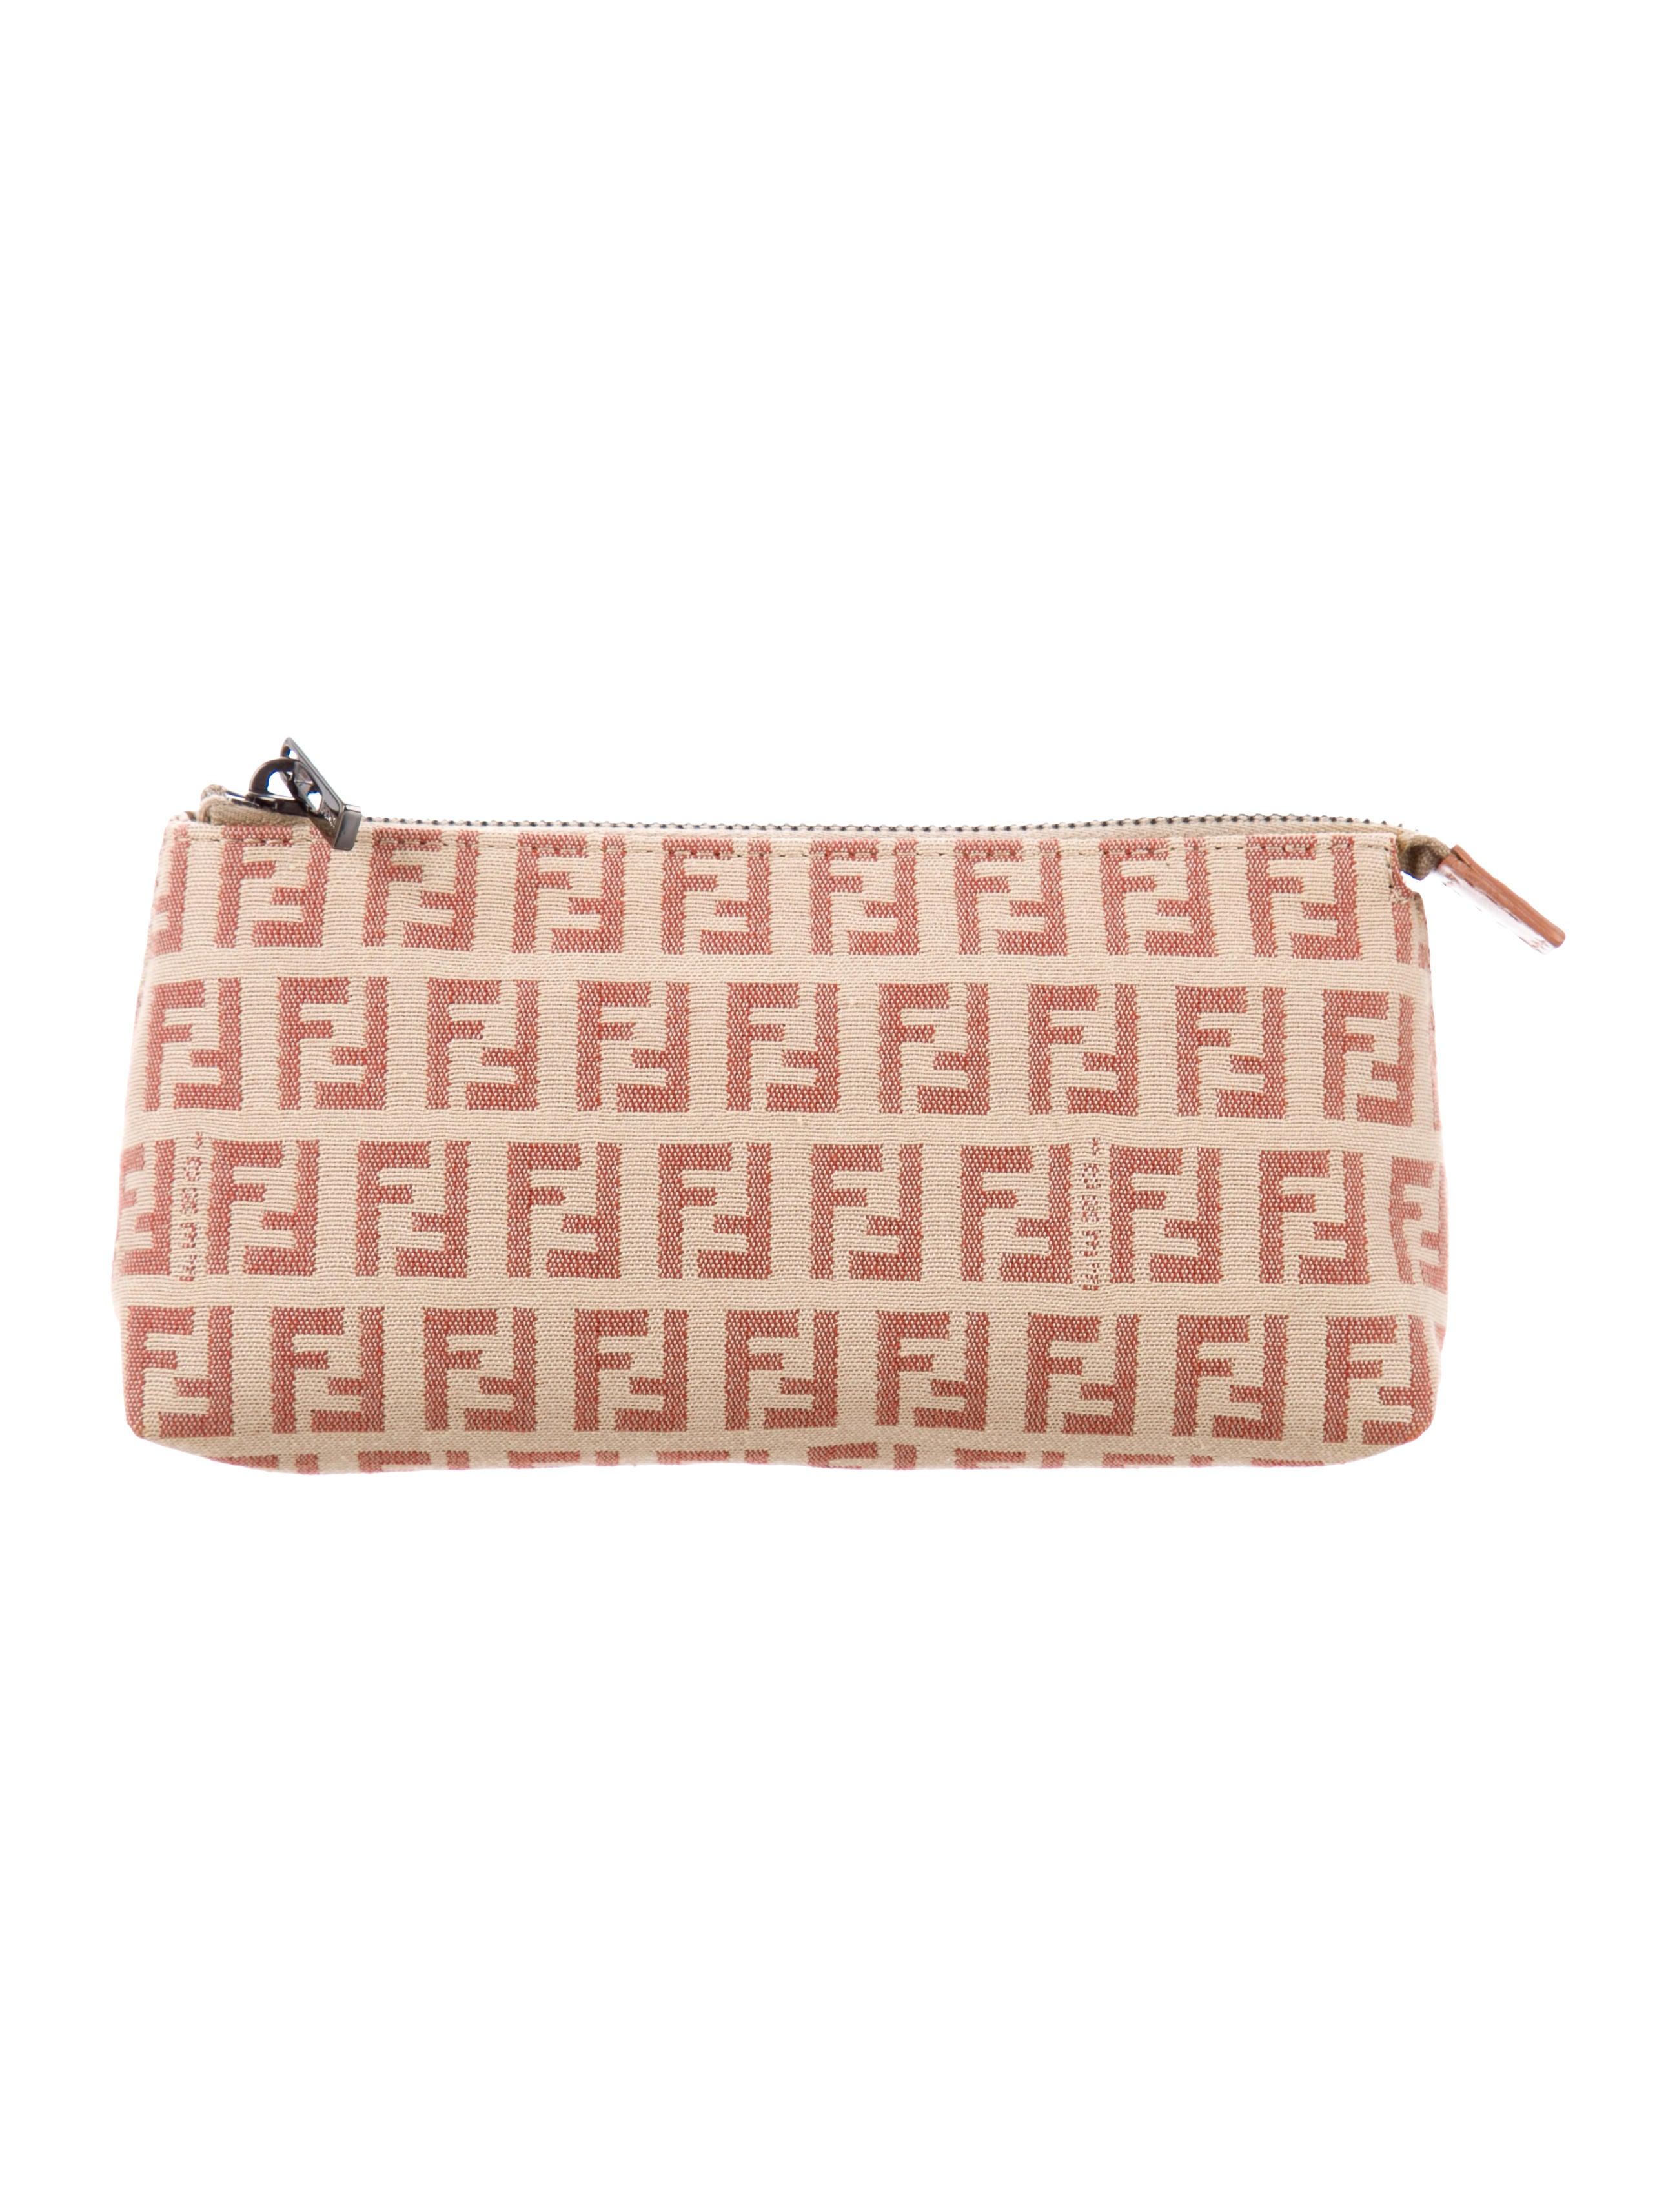 Fendi Zucchino Cosmetic Bag - Accessories - FEN83733  7c7ab4ccd99ae